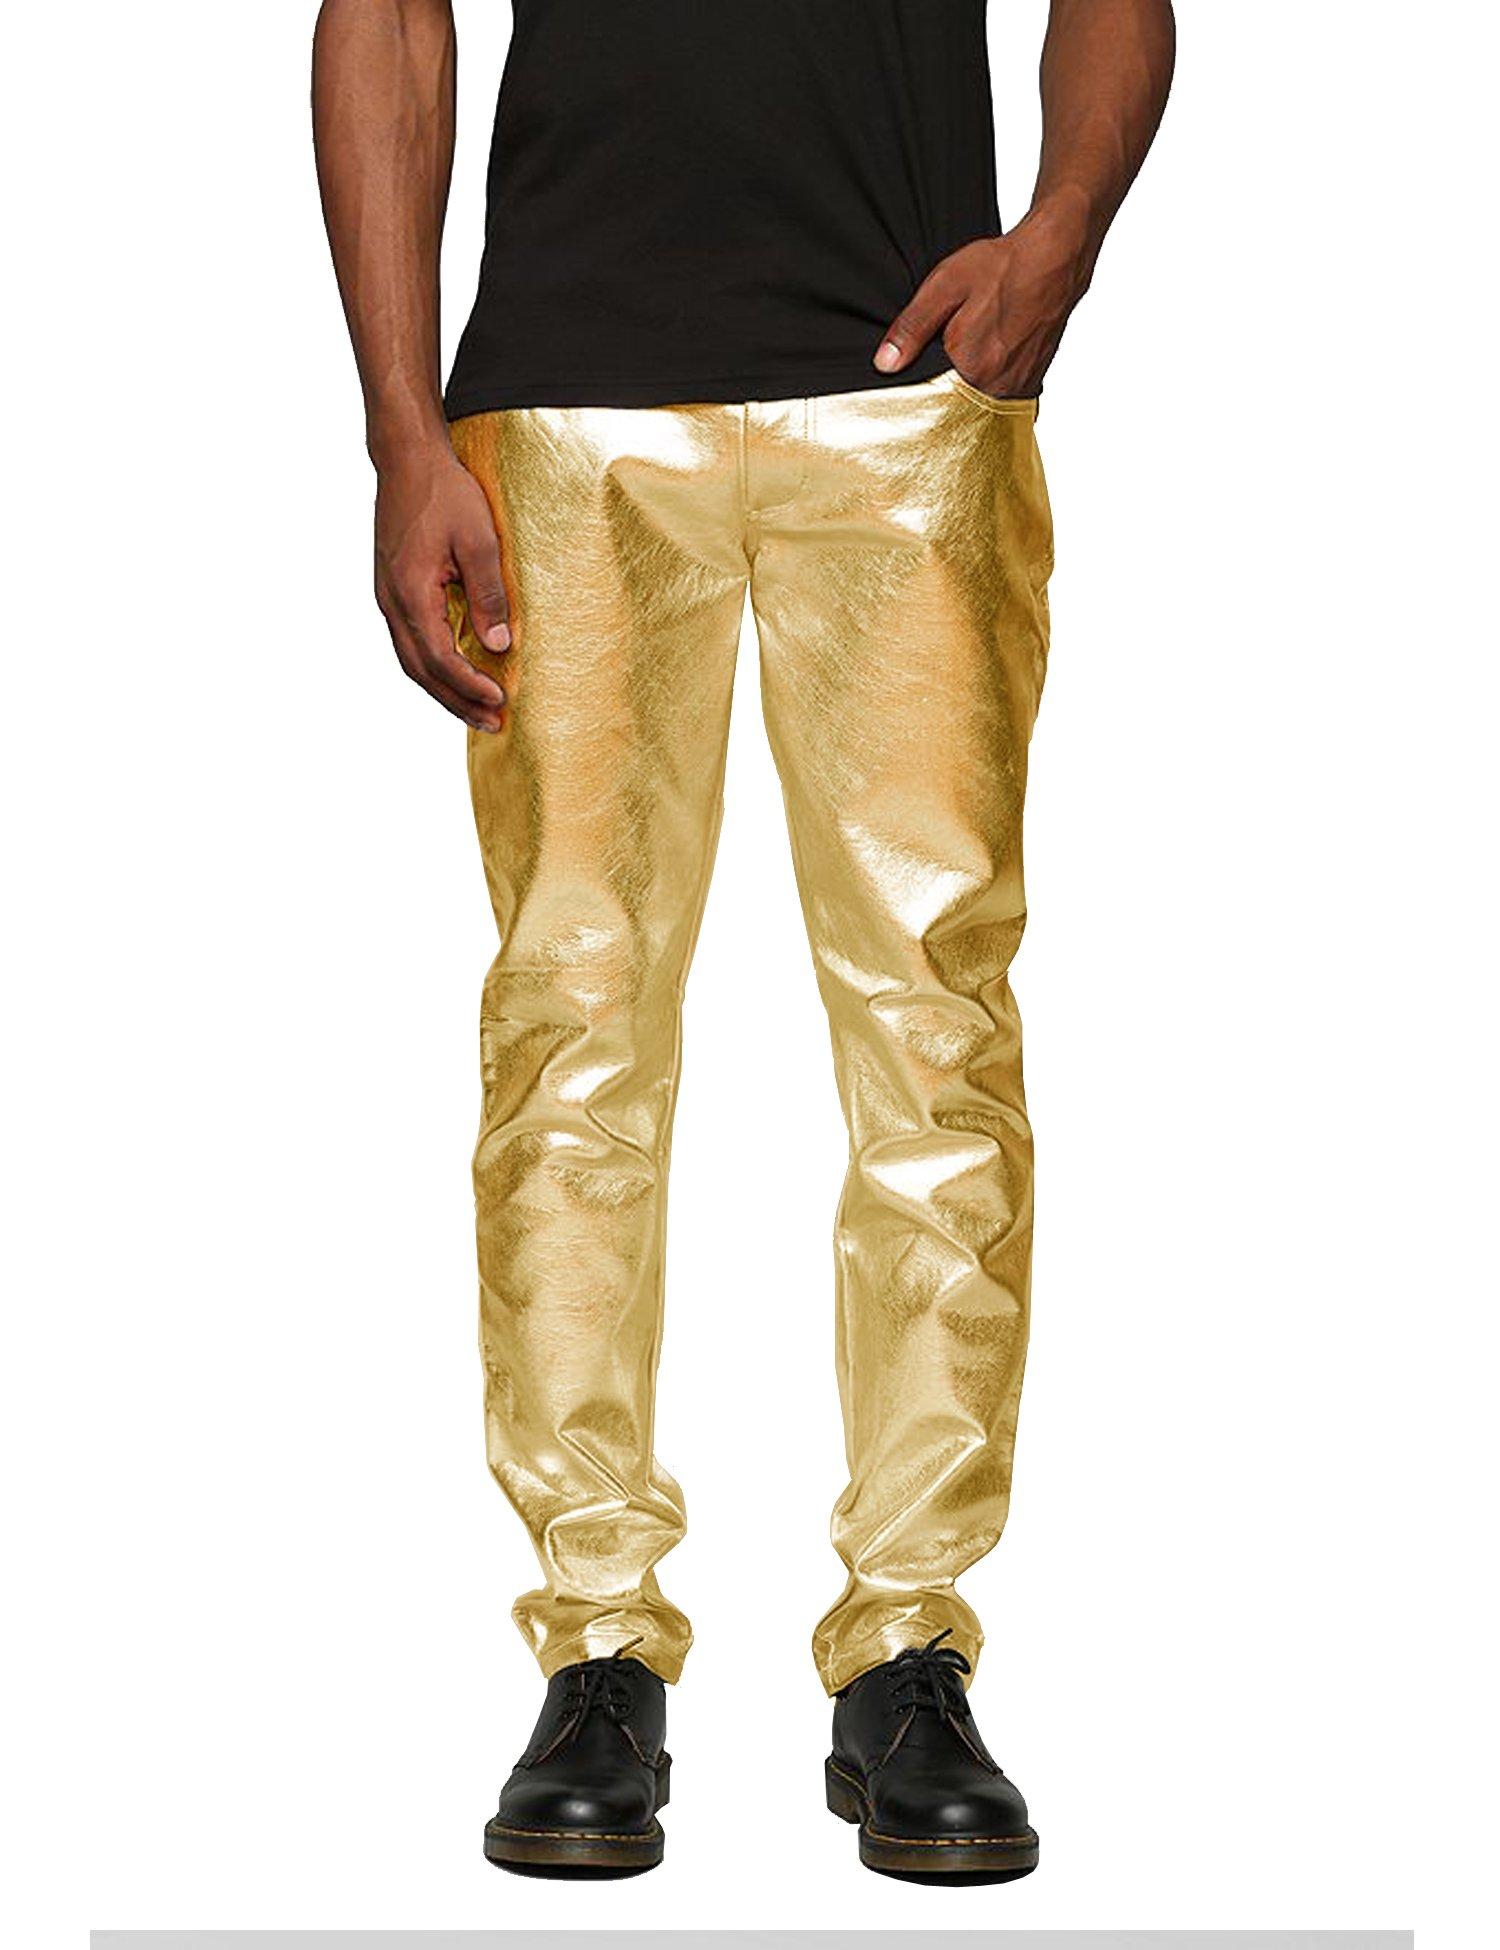 Simbama Mens Zipper Design Moto Jeans Style Metallic Gold Pants Straight Leg Trousers